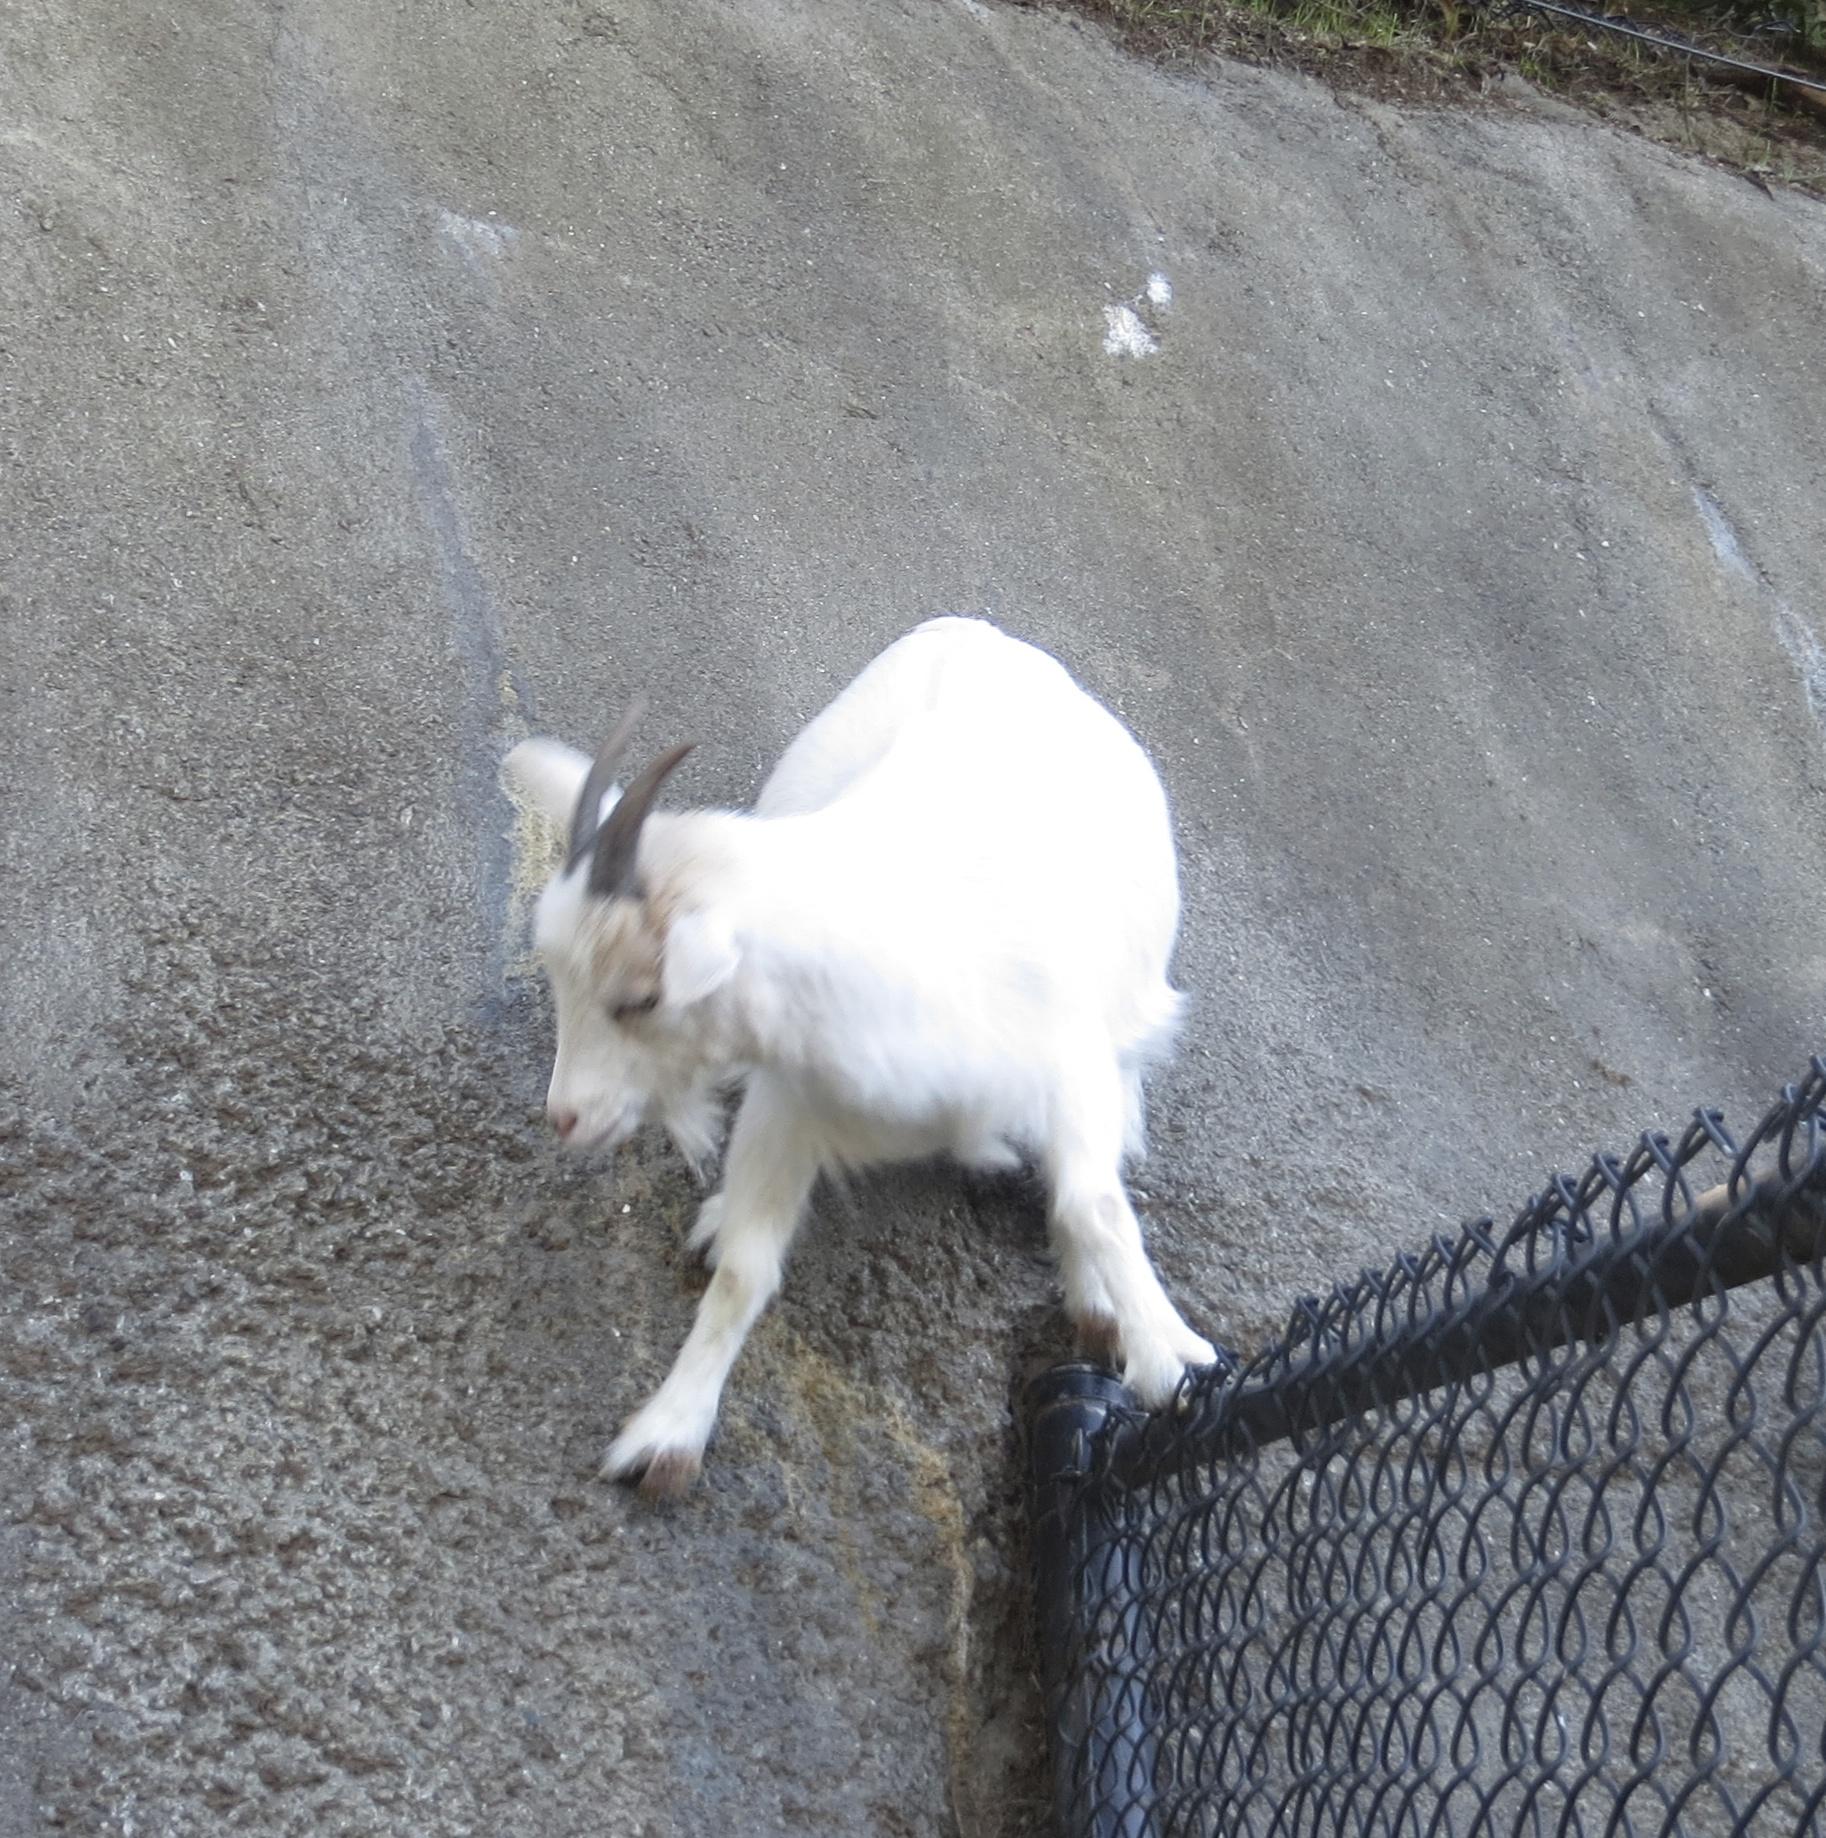 Goat Climbing Wall